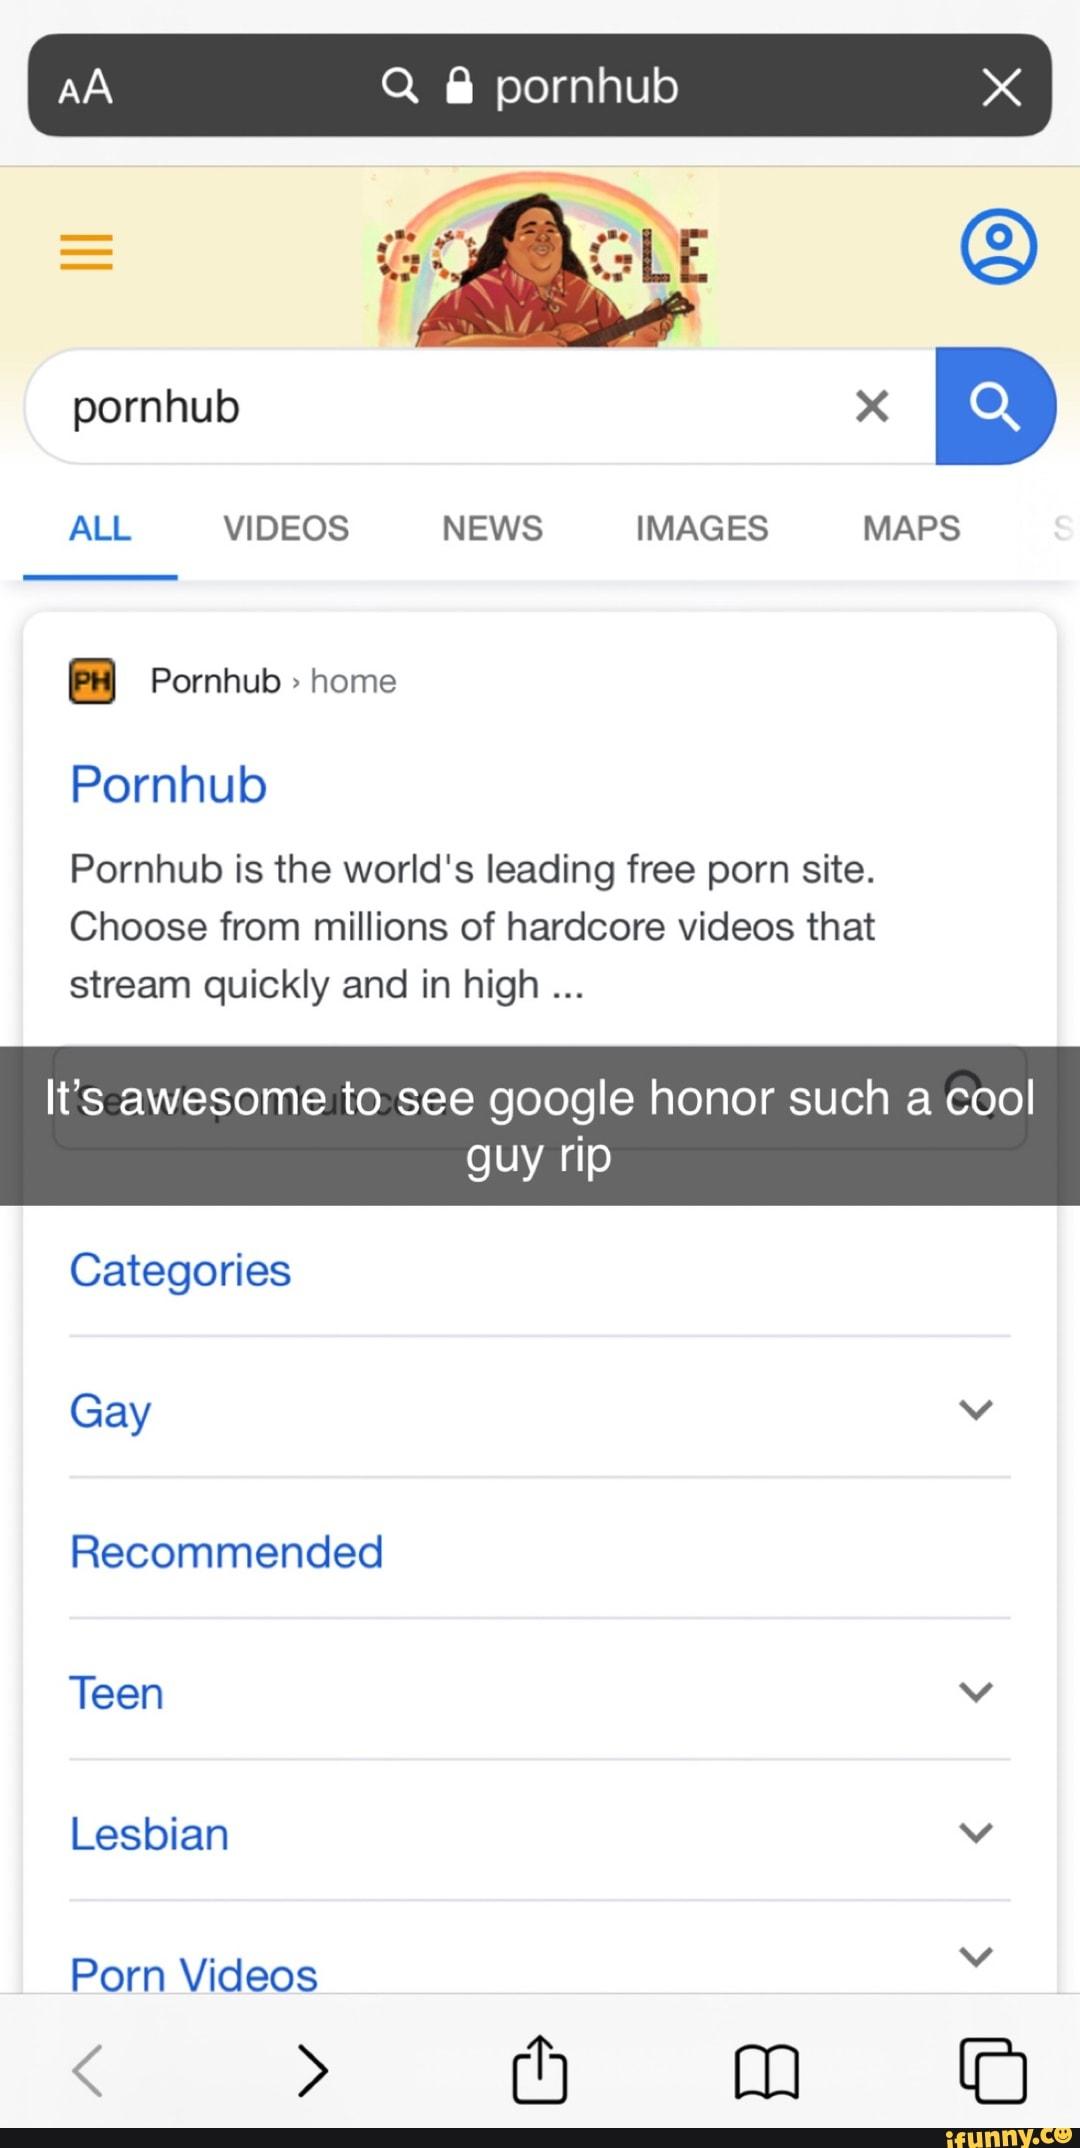 AA Q pornhub ALL VIDEOS NEWS IMAGES MAPS En Pornhub is the